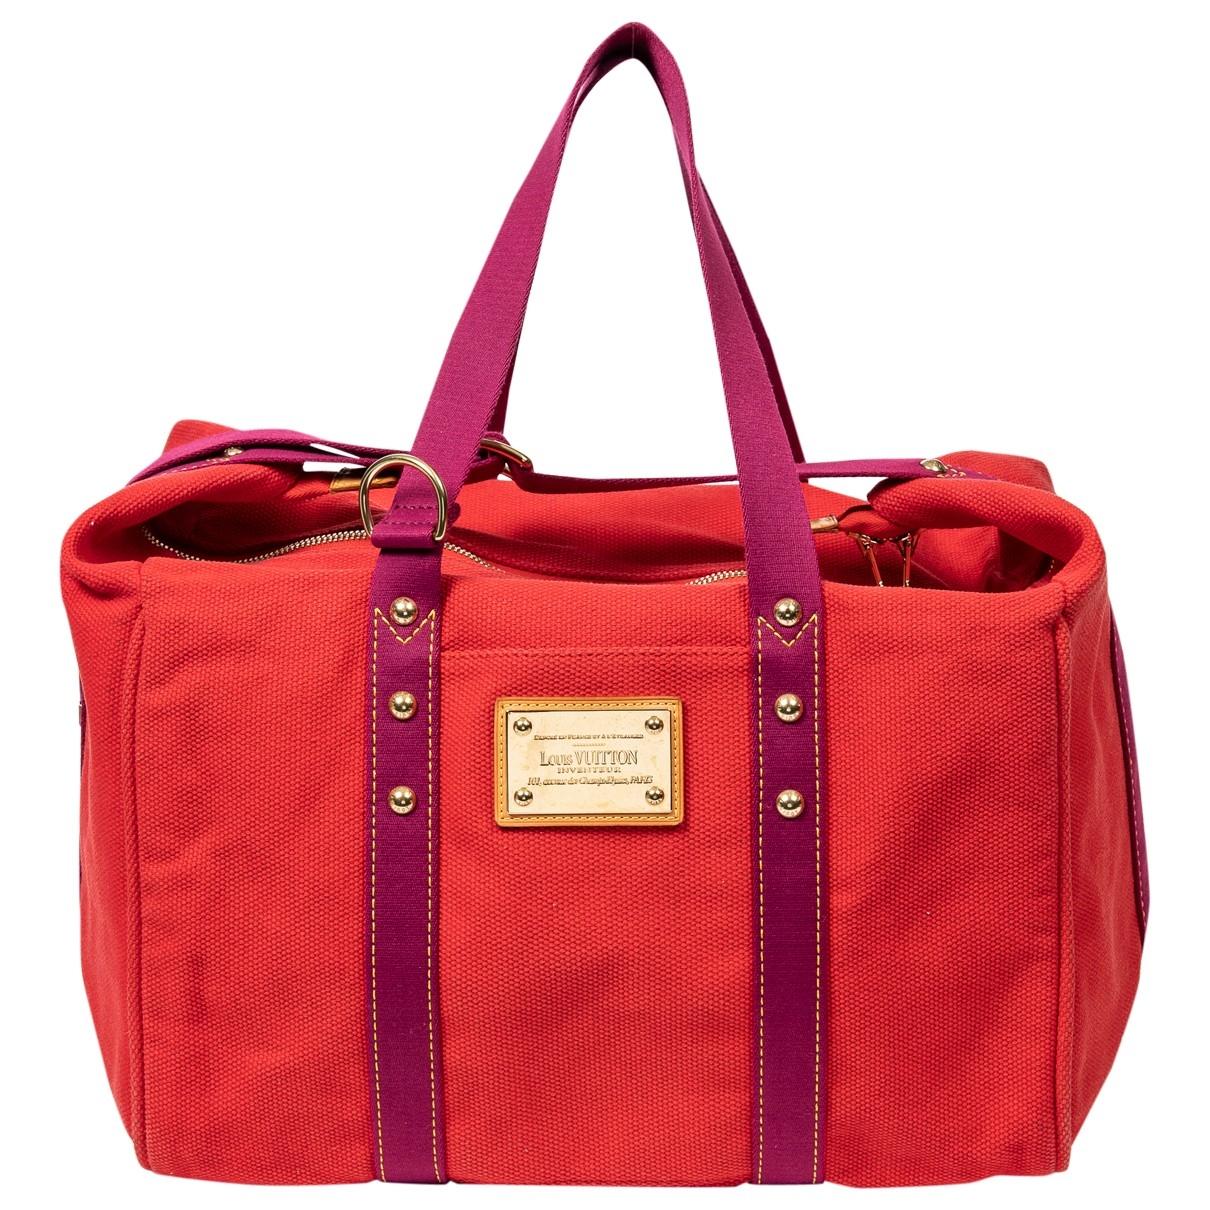 Louis Vuitton Antigua Handtasche in  Rot Leinen